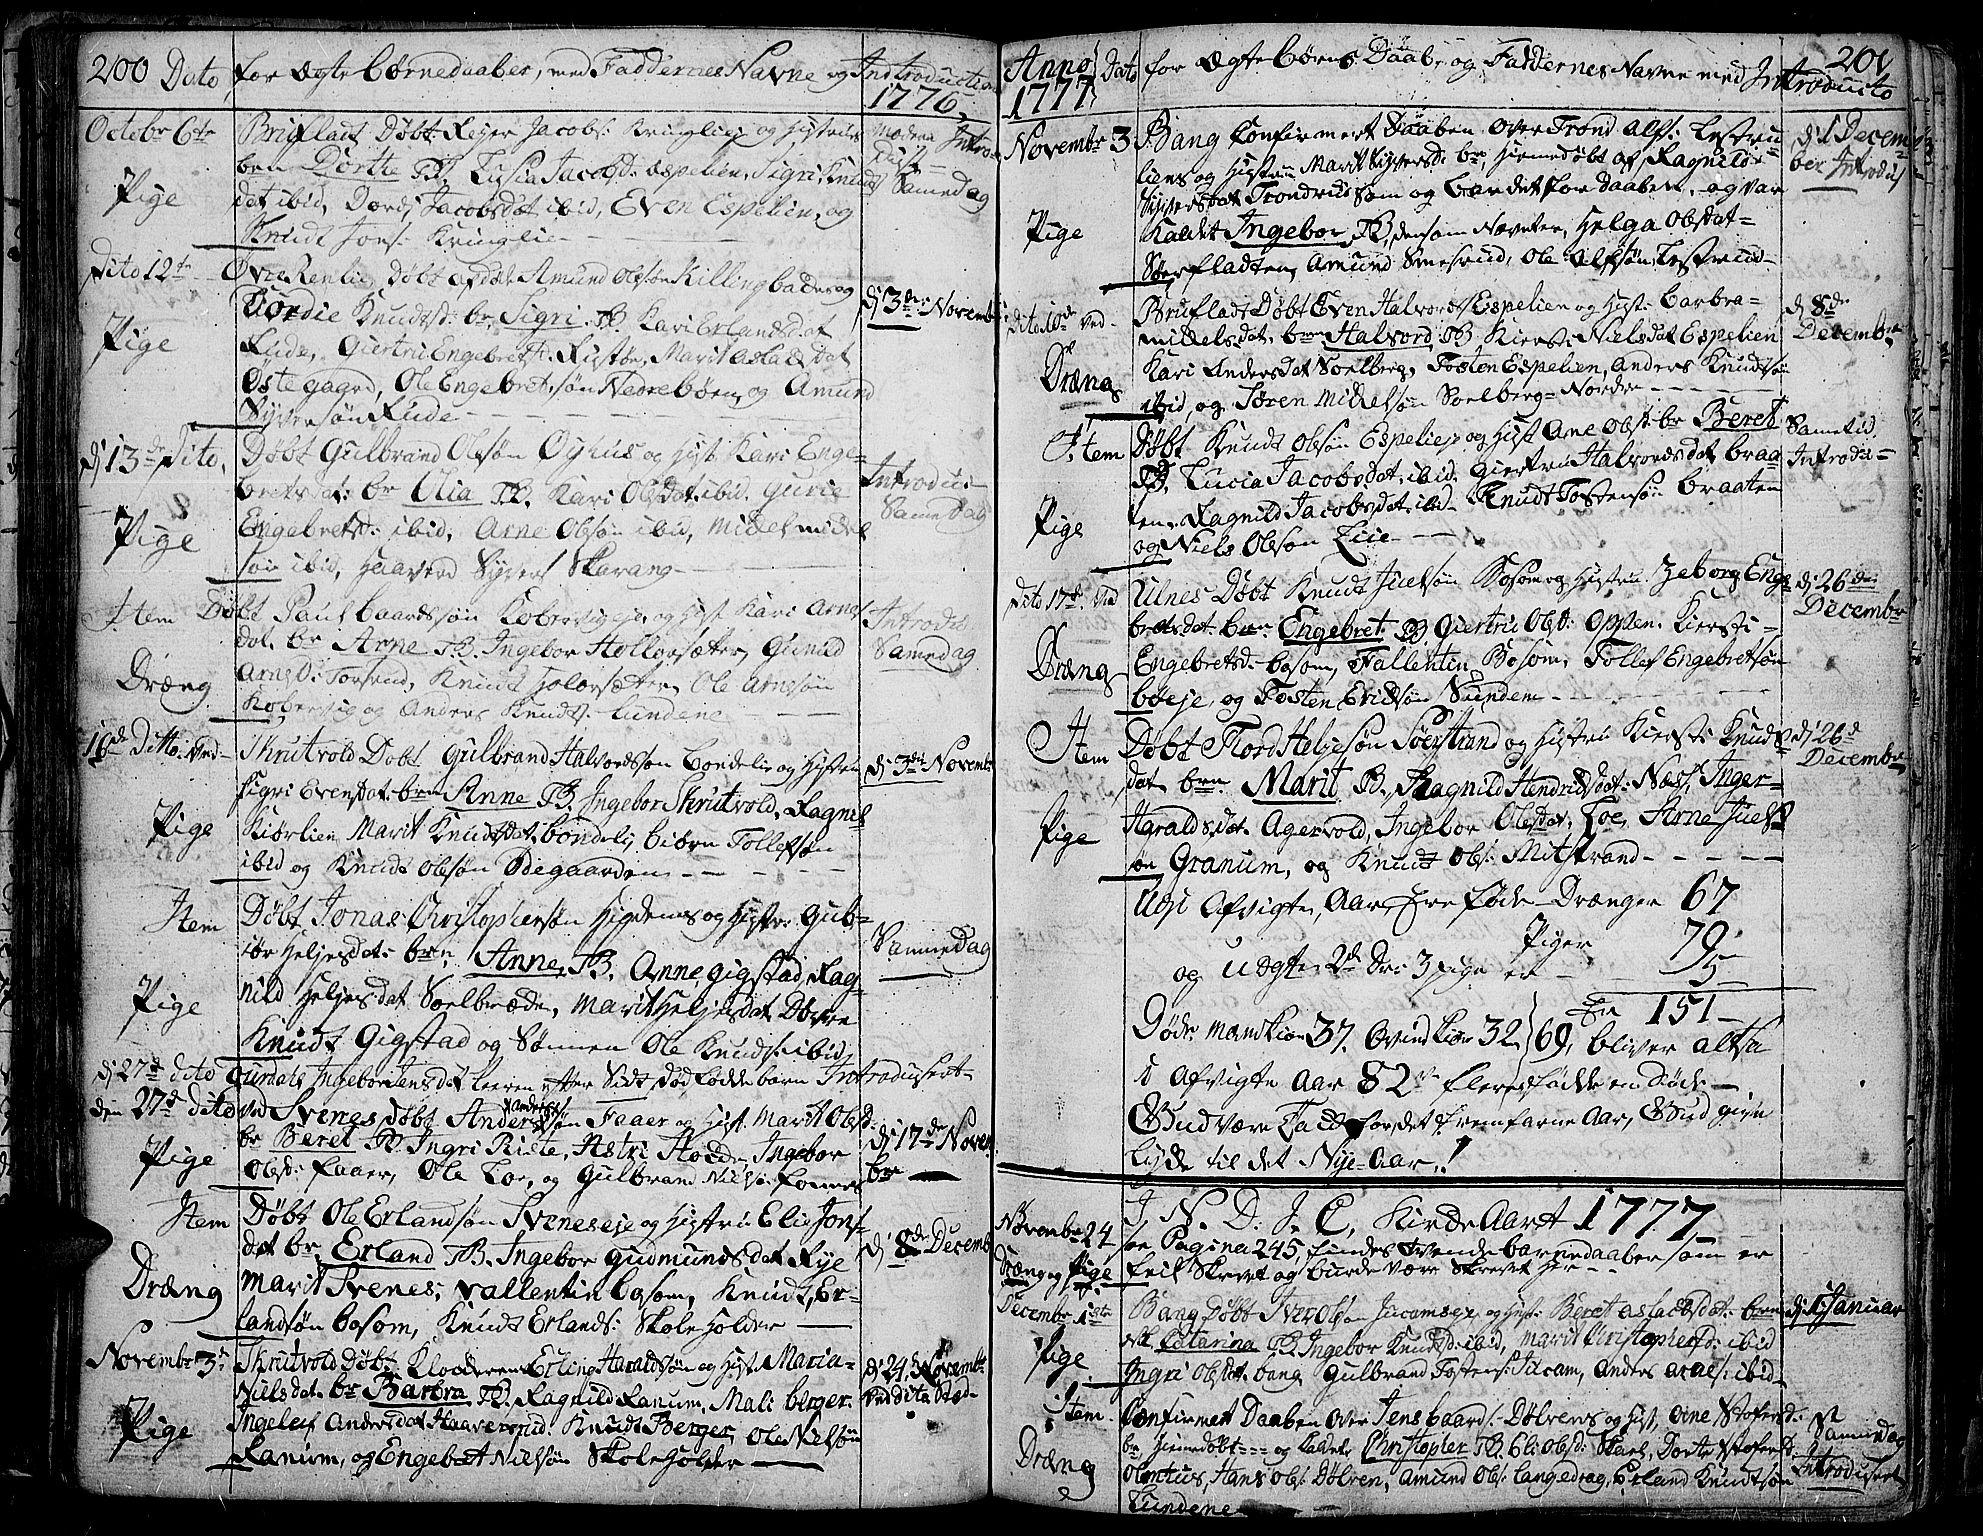 SAH, Aurdal prestekontor, Ministerialbok nr. 5, 1763-1781, s. 200-201